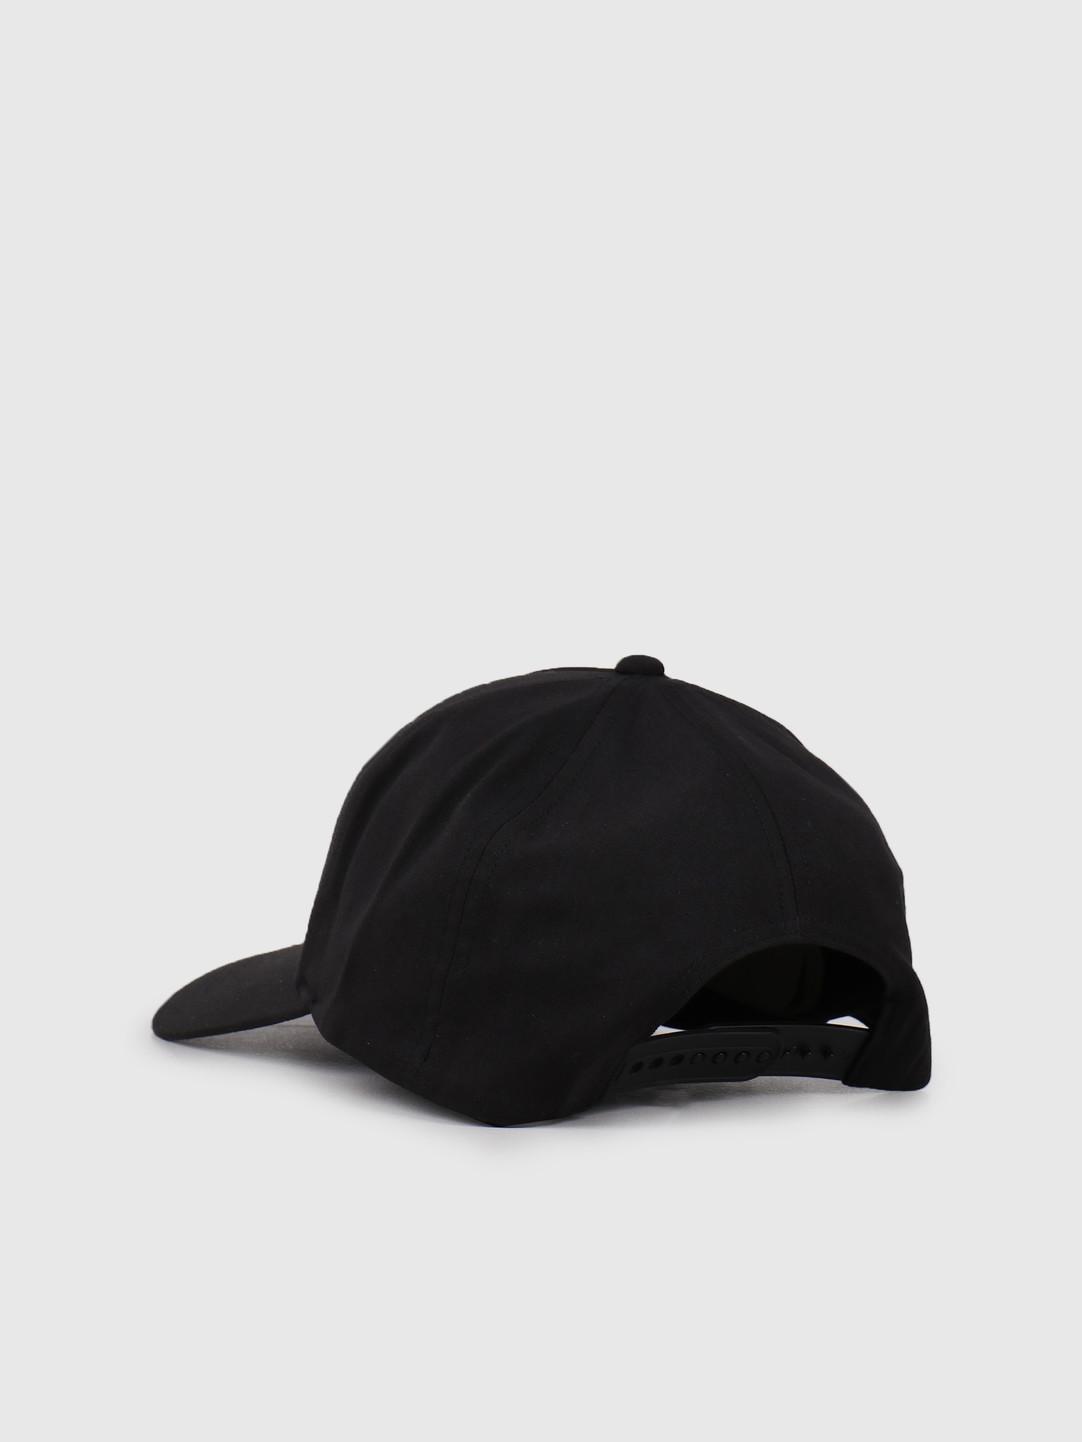 Arc'teryx Arc'teryx Multi Crest Ball Cap Black 25192